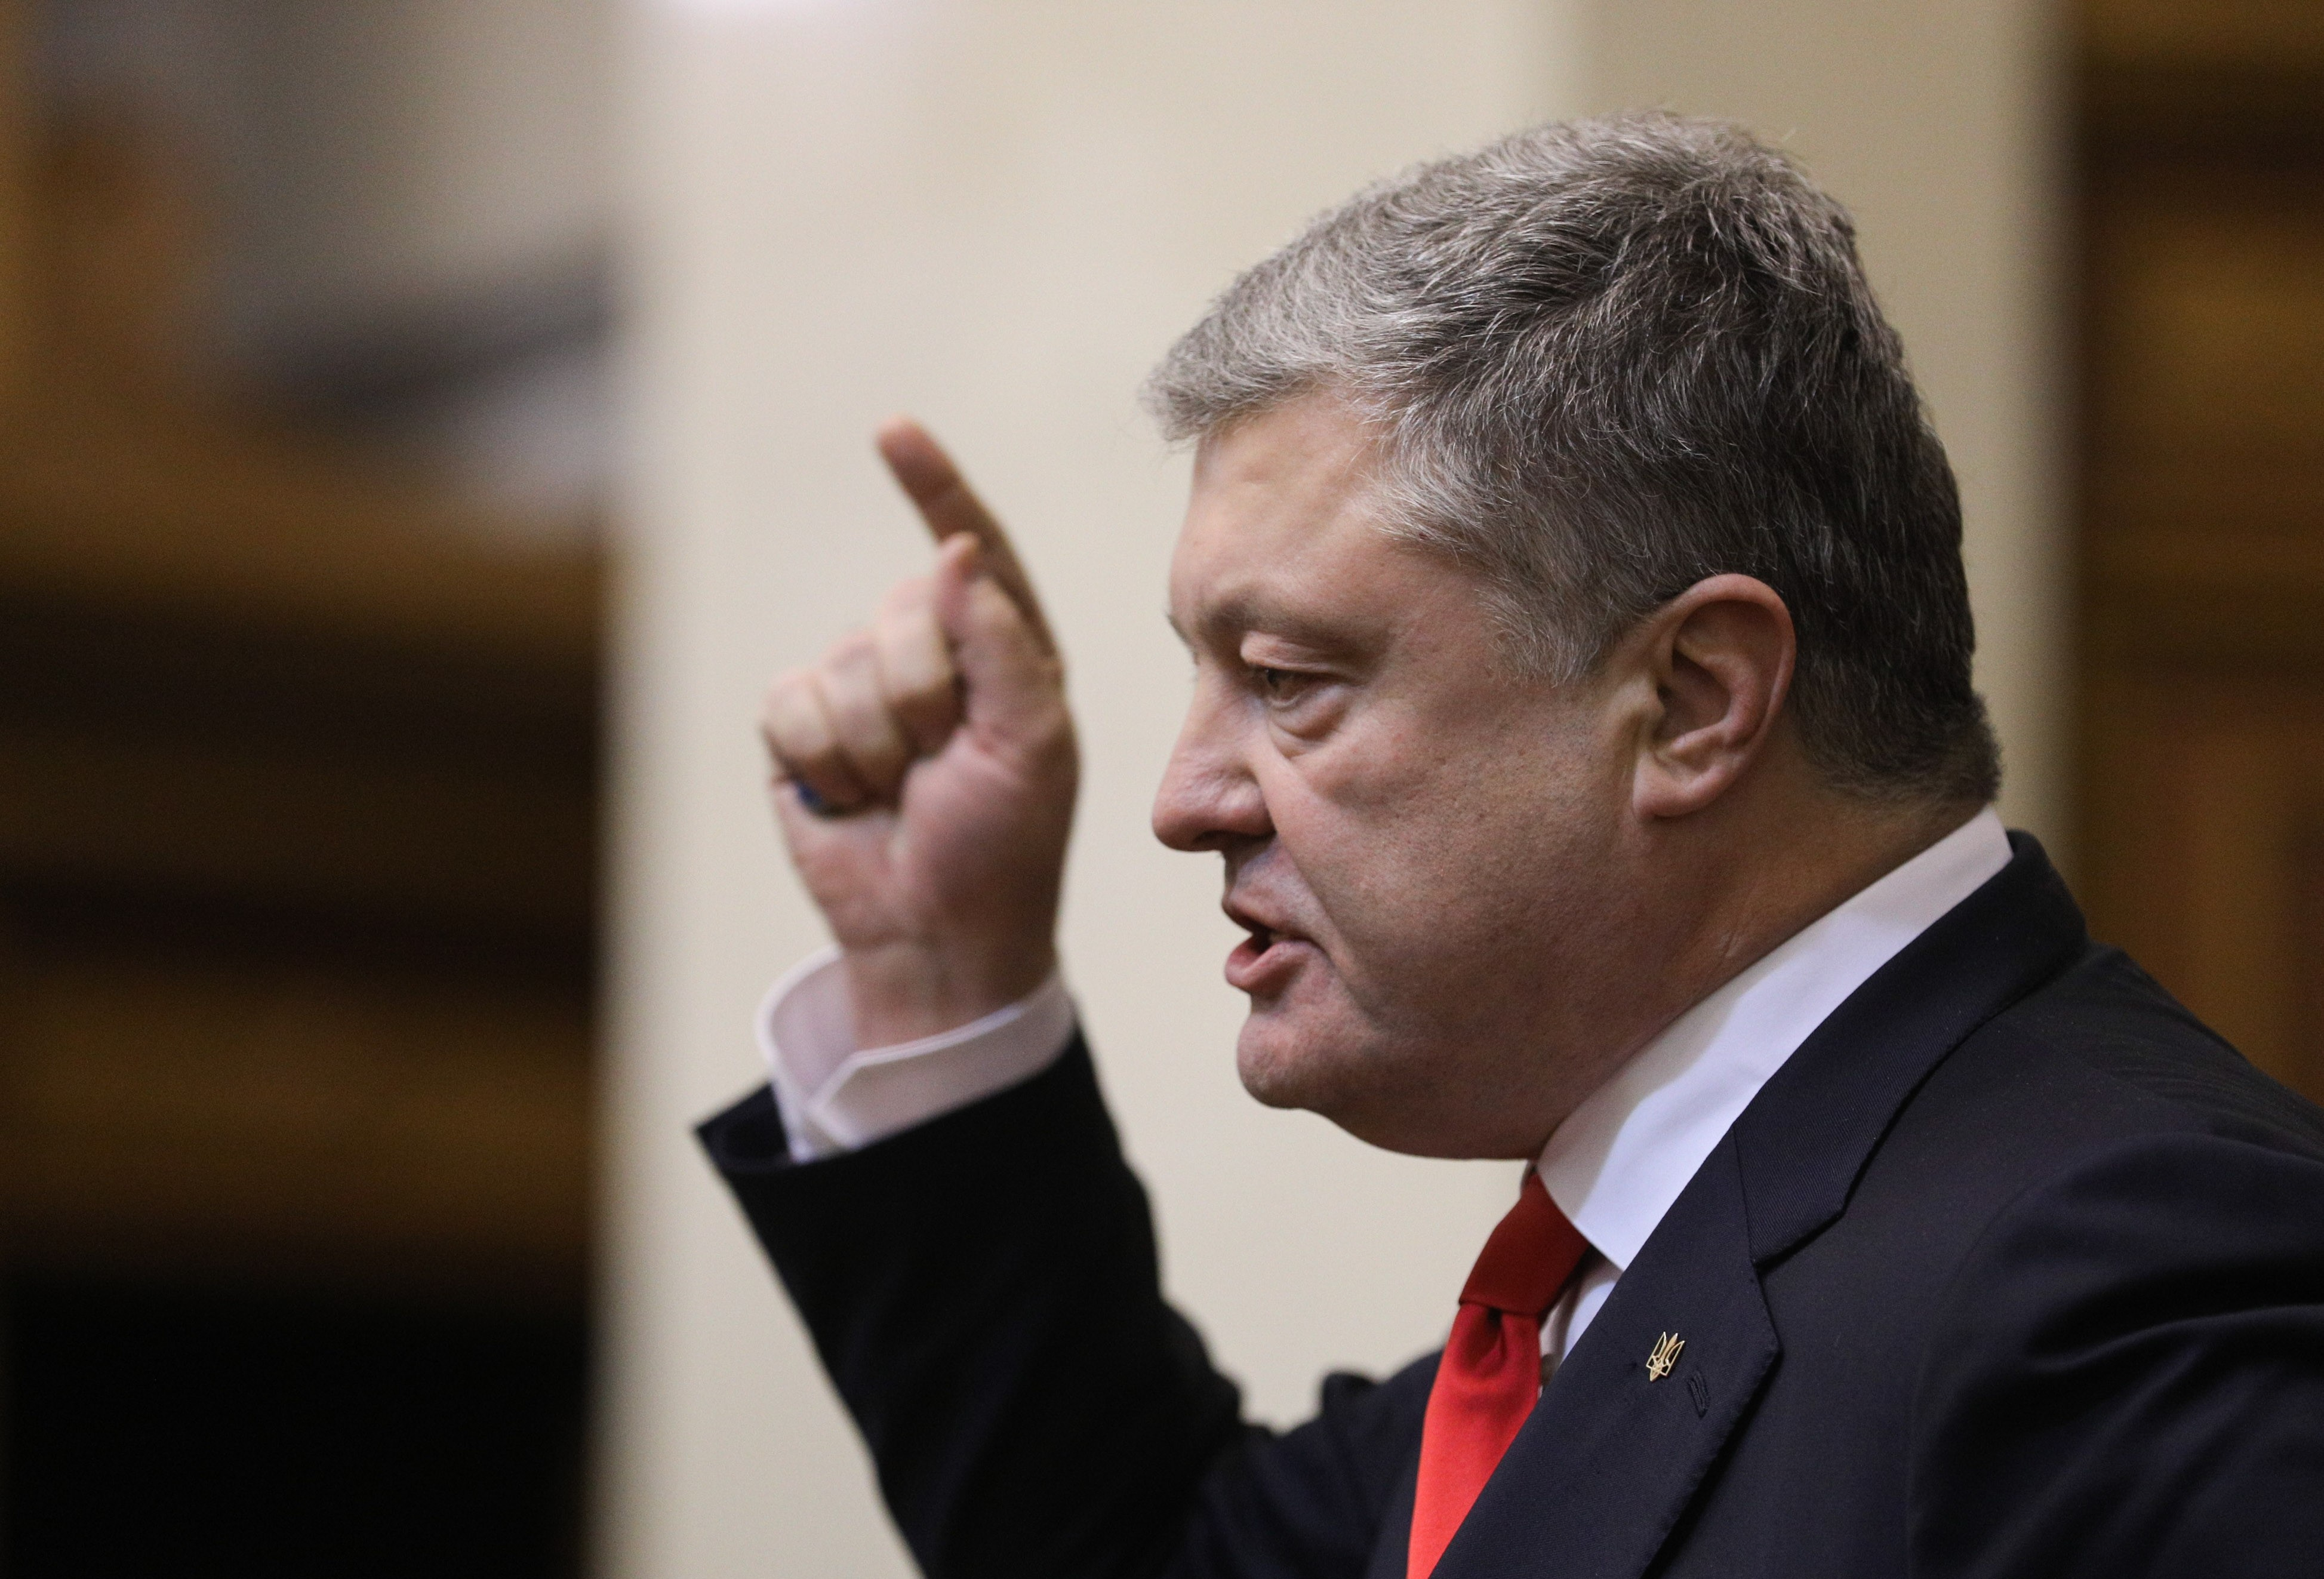 <p>Фото: &copy; РИА Новости / Михаил Палинчак</p>